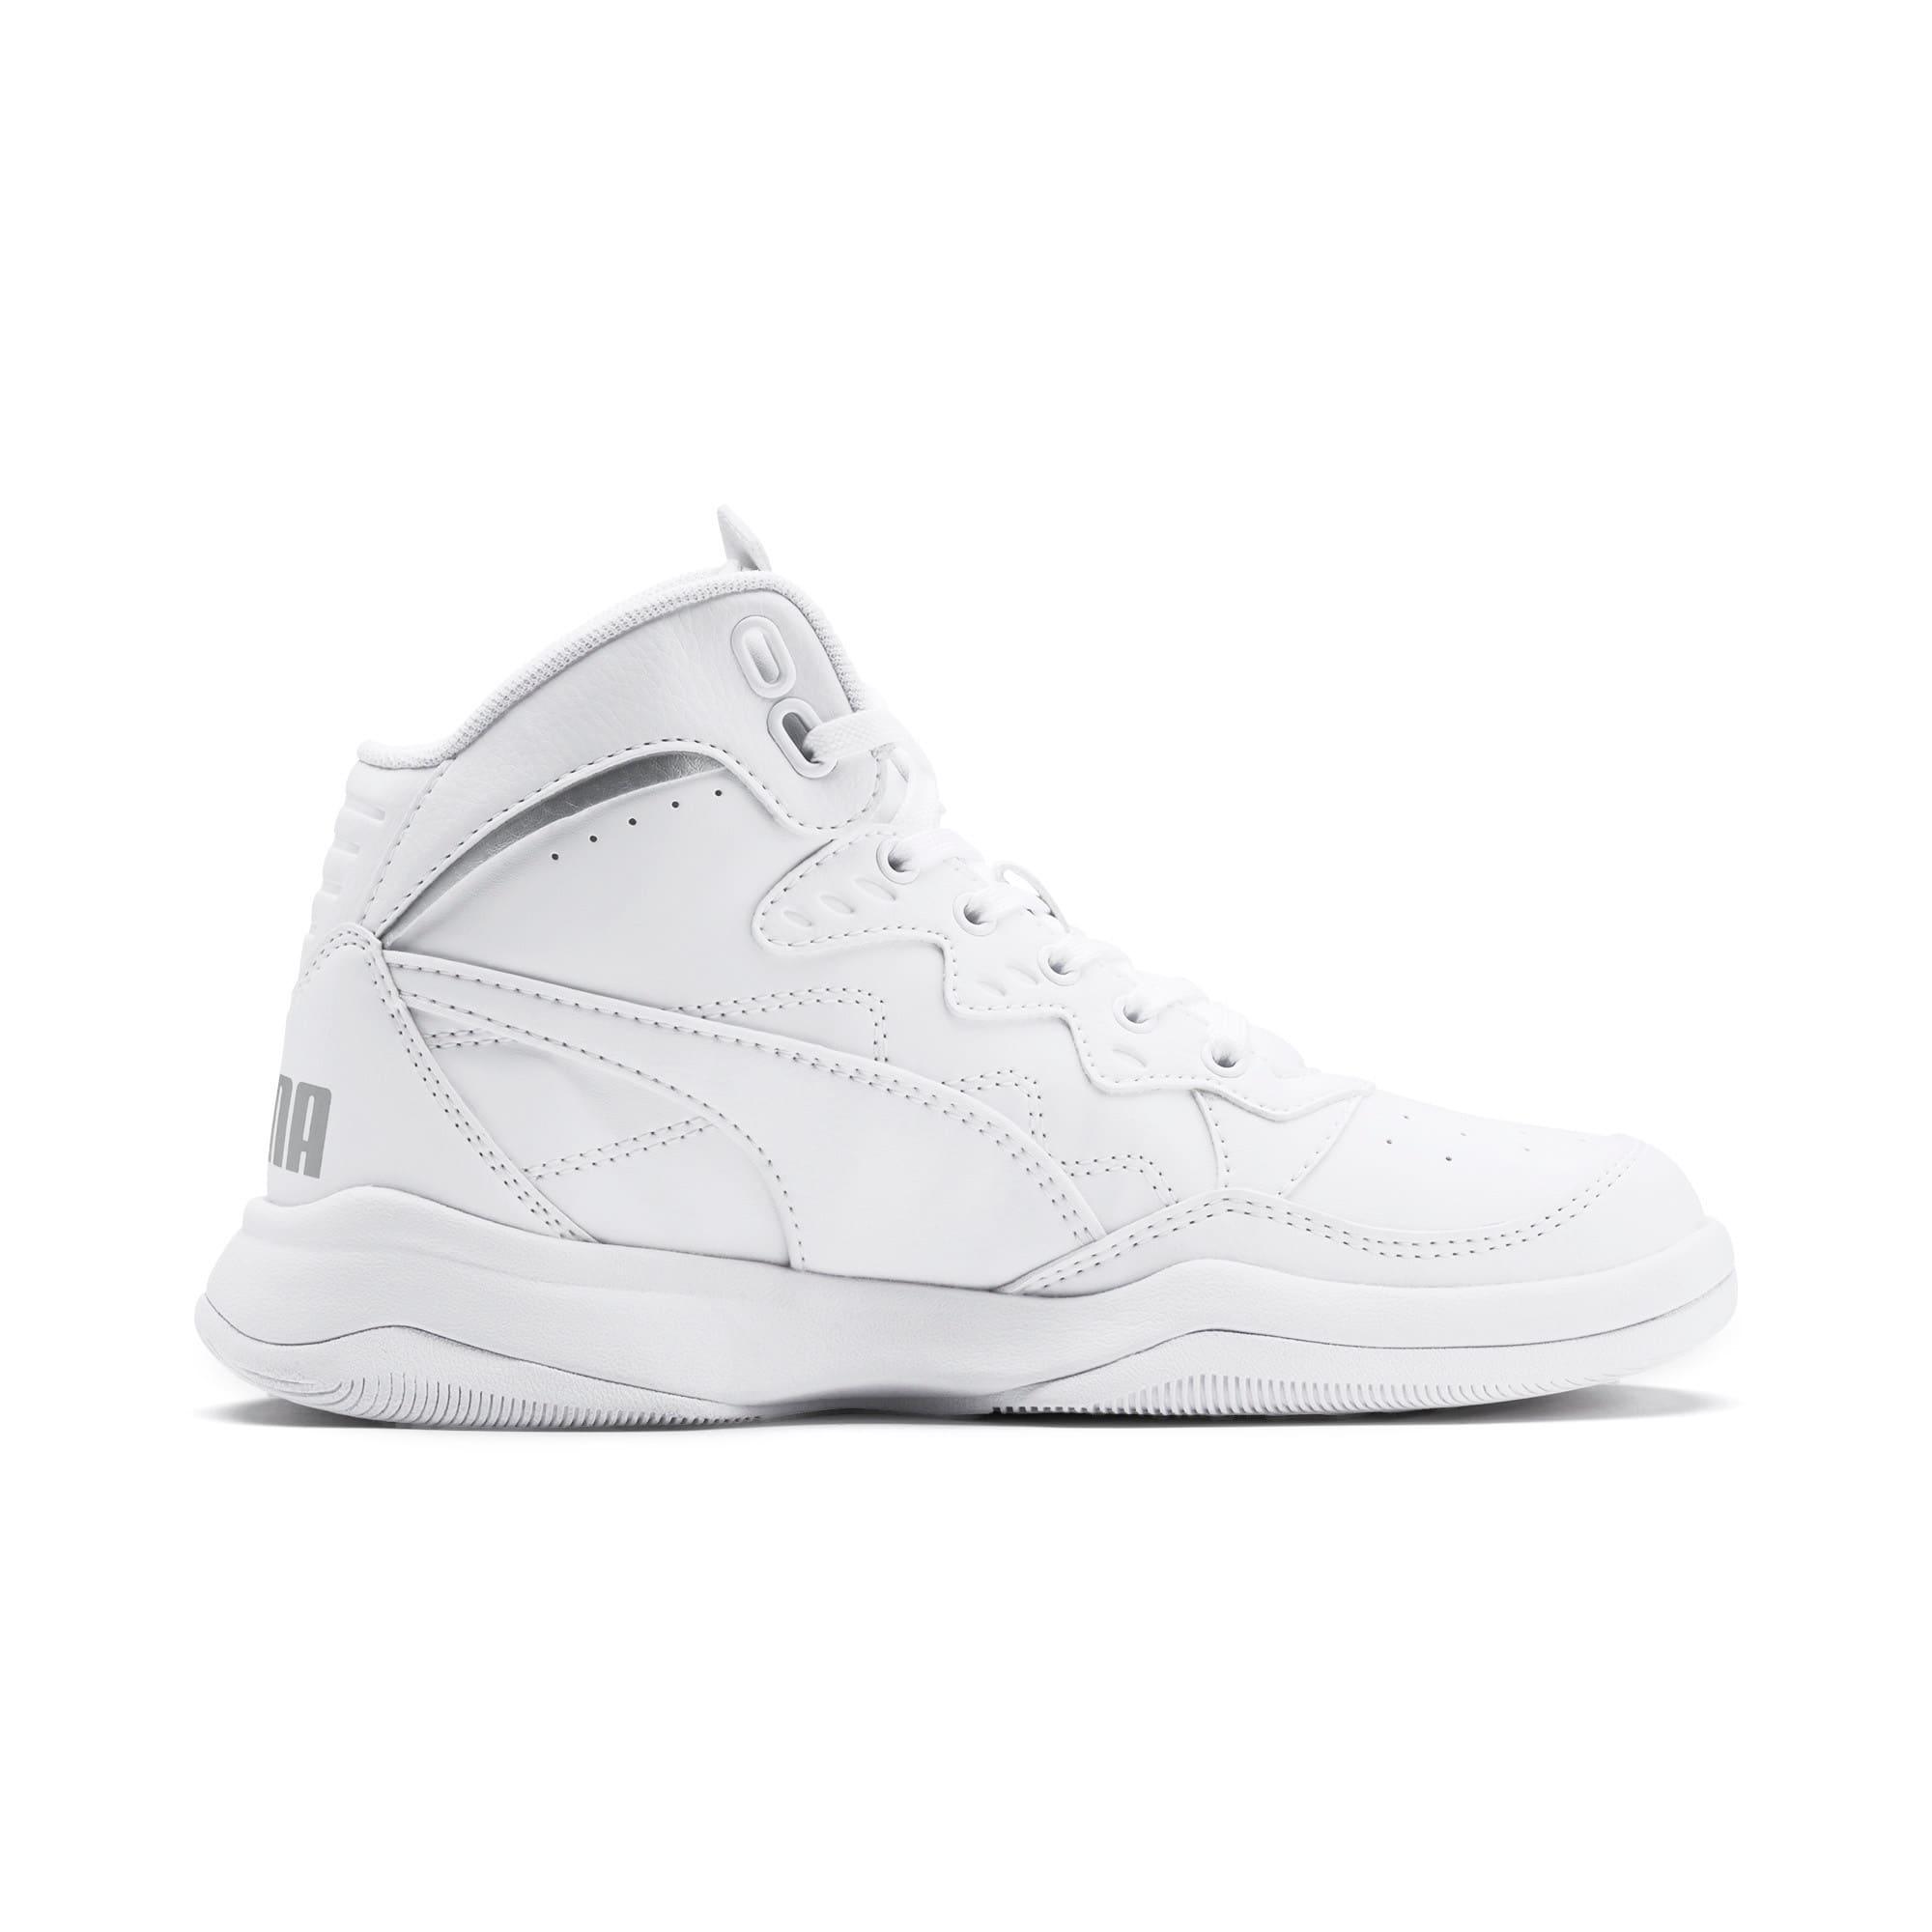 Thumbnail 5 of PUMA Rebound Playoff SL Sneakers JR, Puma White-Puma Silver, medium